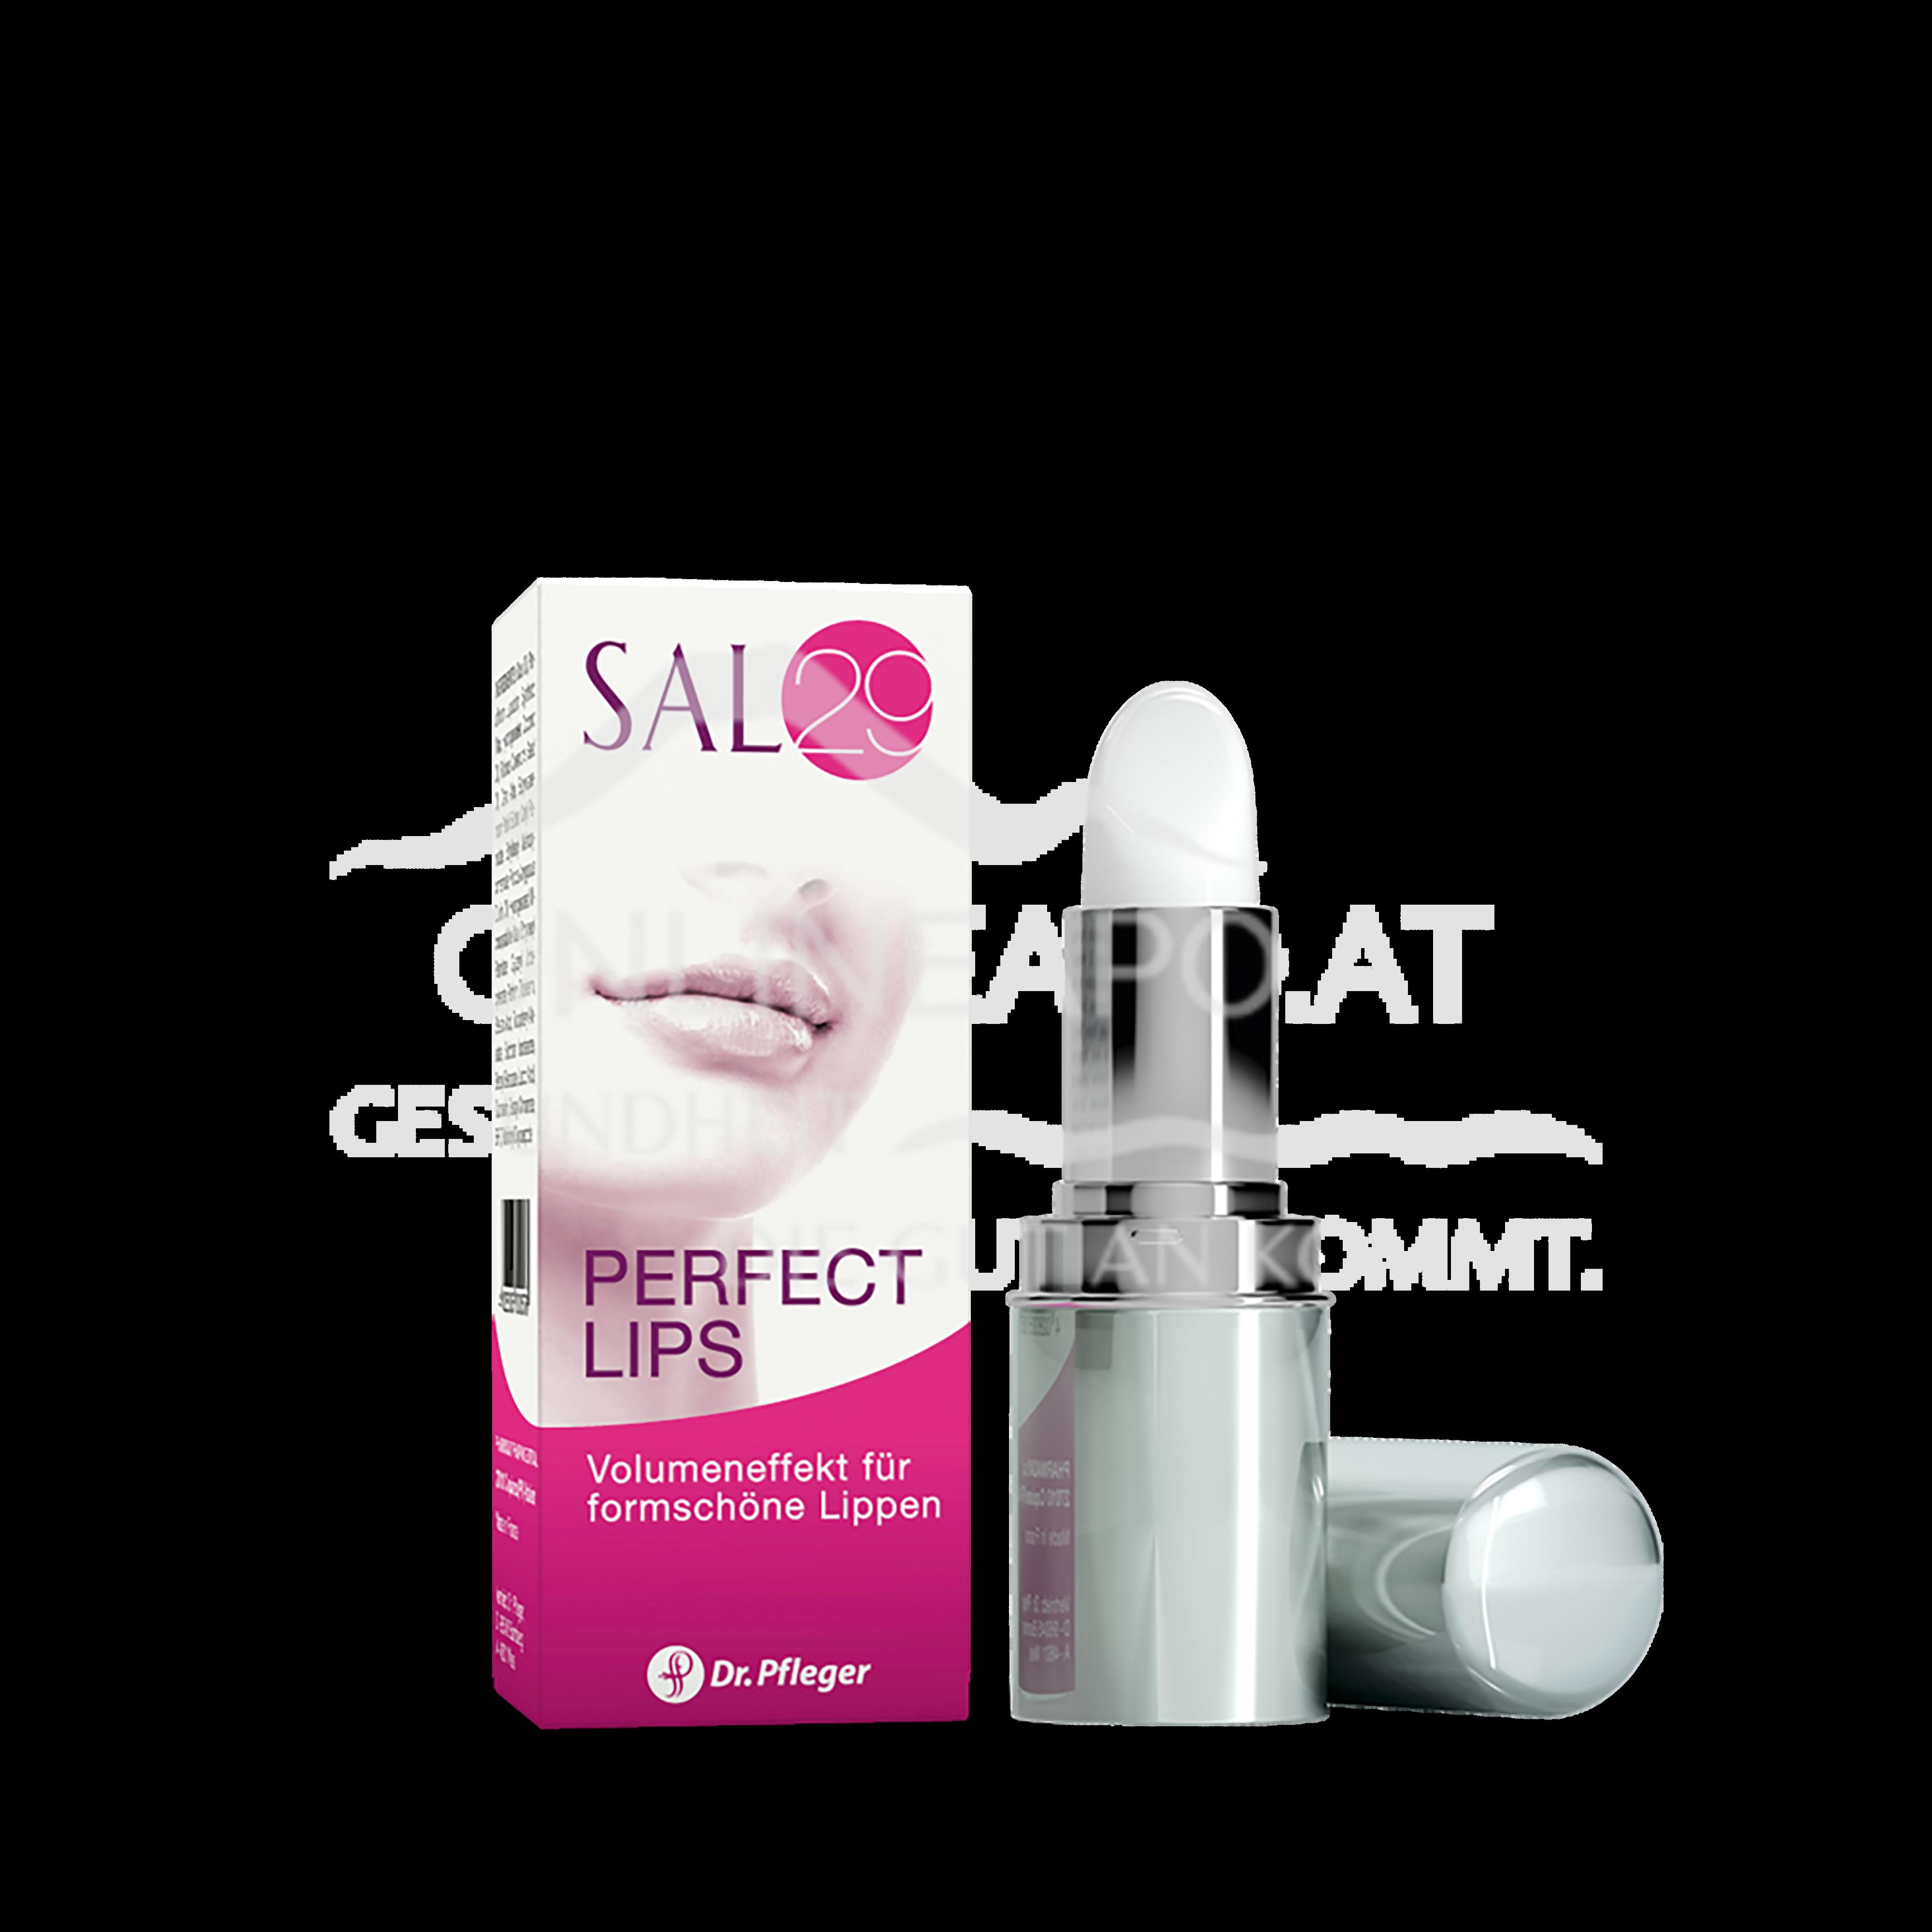 SAL 29 Perfect Lips